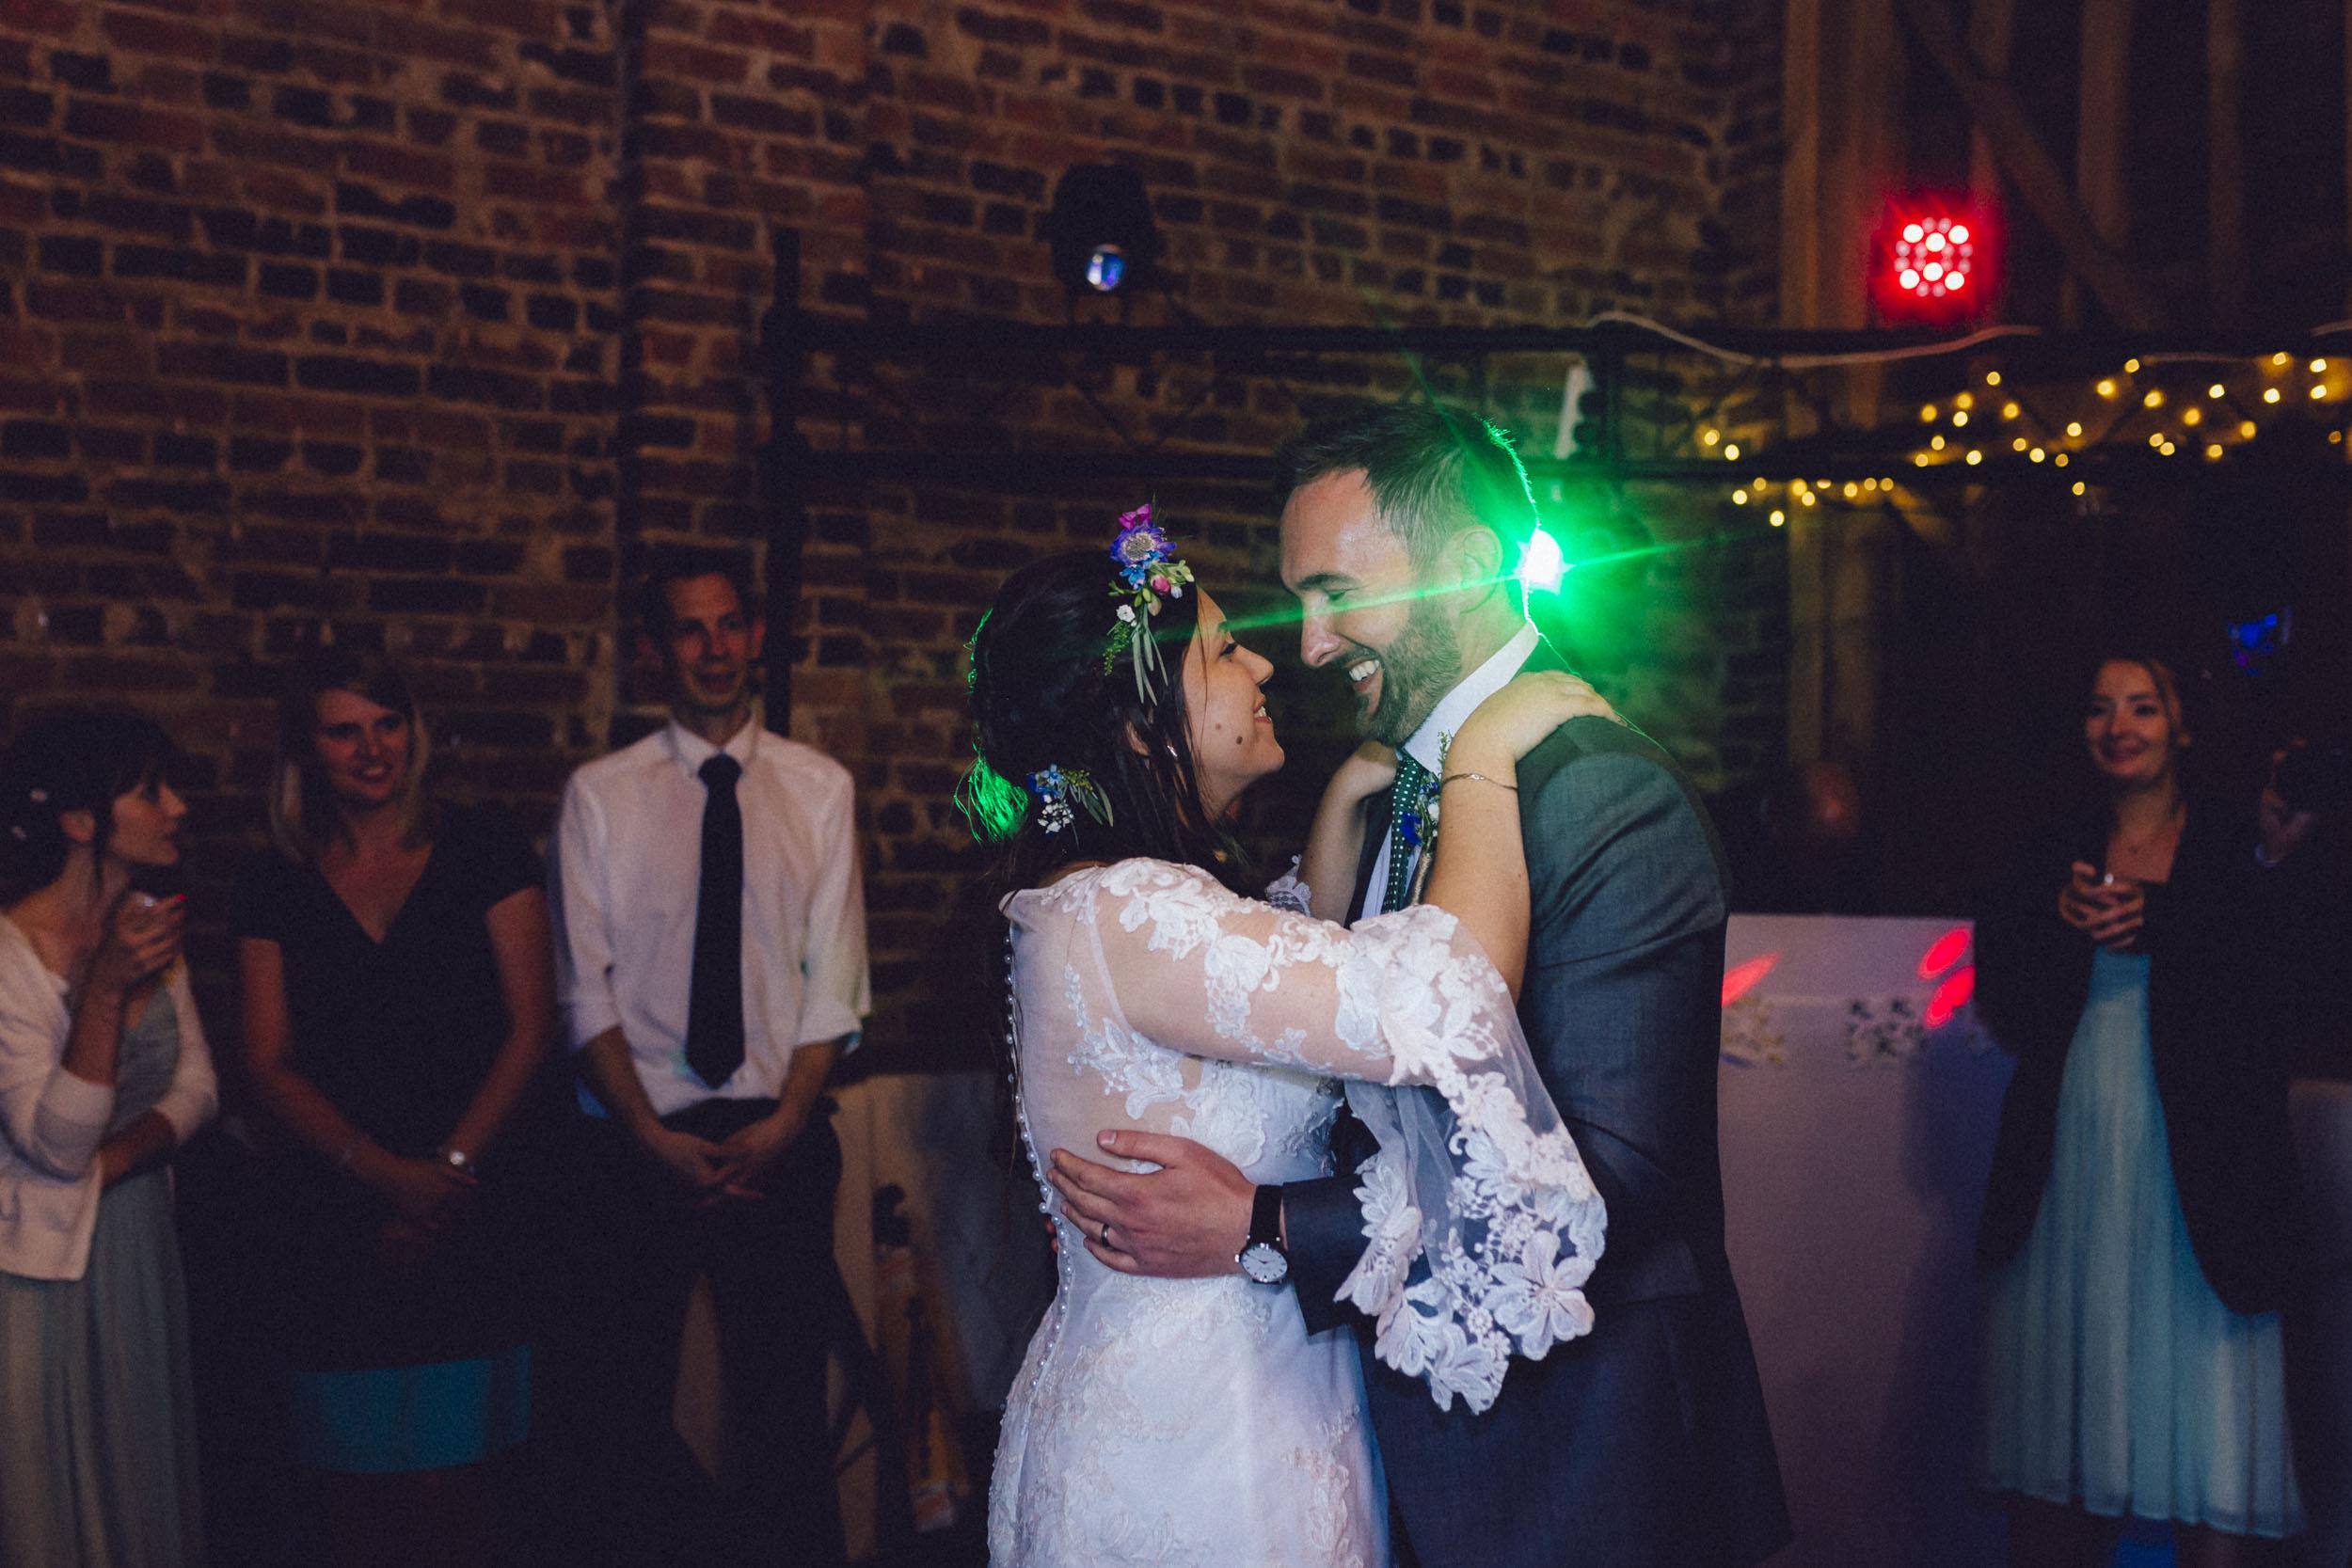 35Curious Rose Wedding Photography- Laura Rhodes- Newton Park Farm- Birmingham Artistic wedding photography-bride and groom first dance.jpg